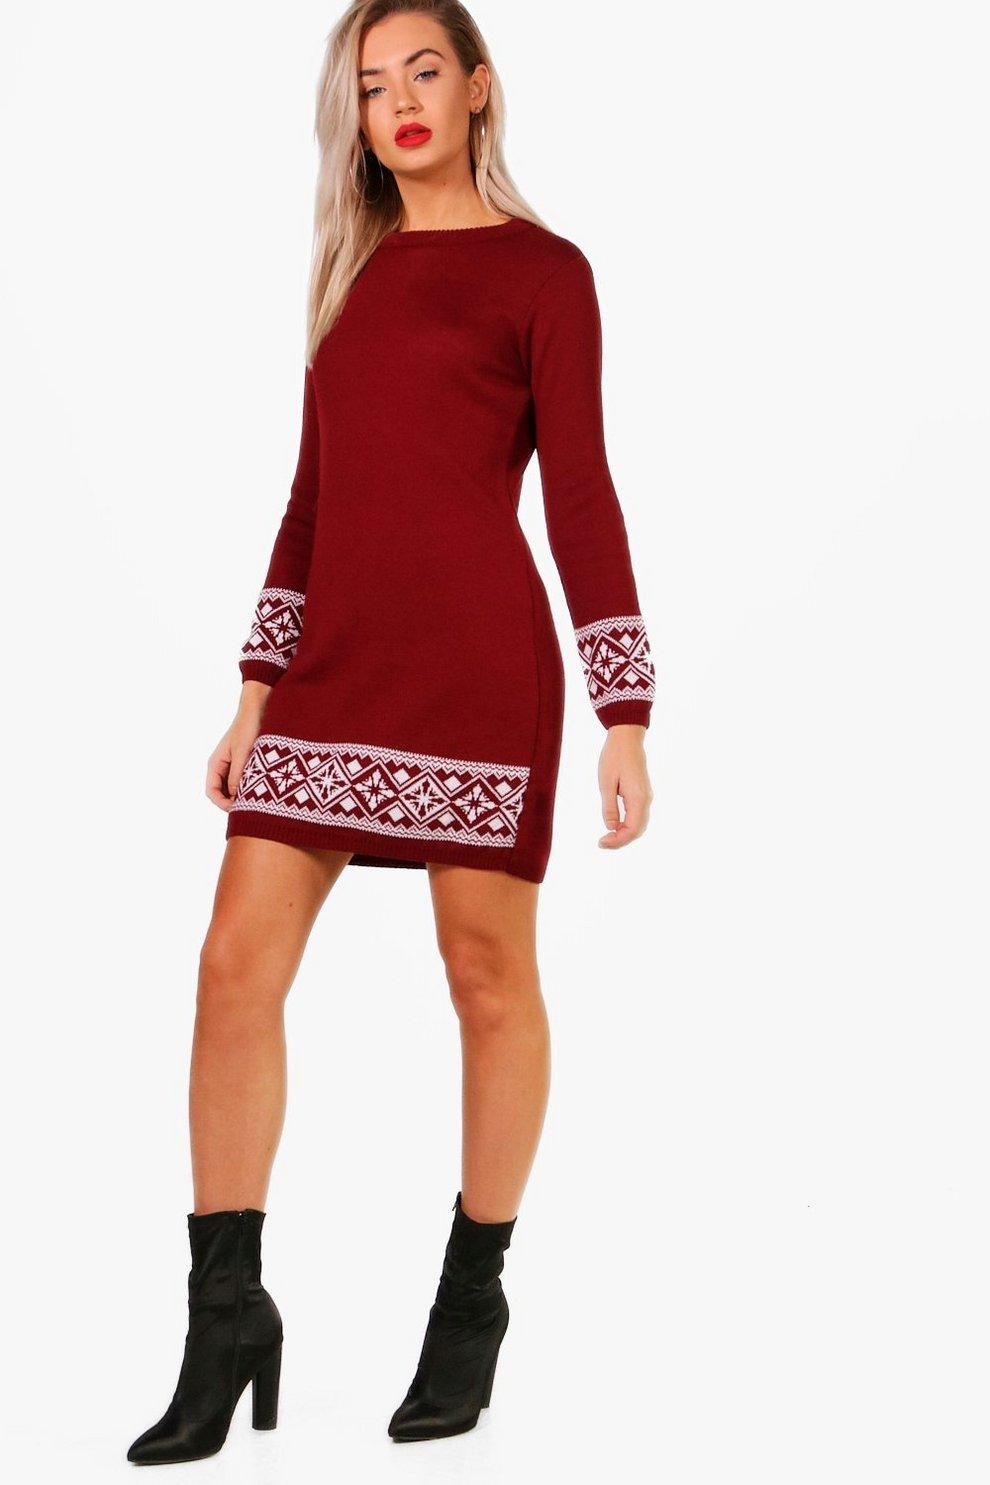 Camilla Fairisle Christmas Jumper Dress | Boohoo